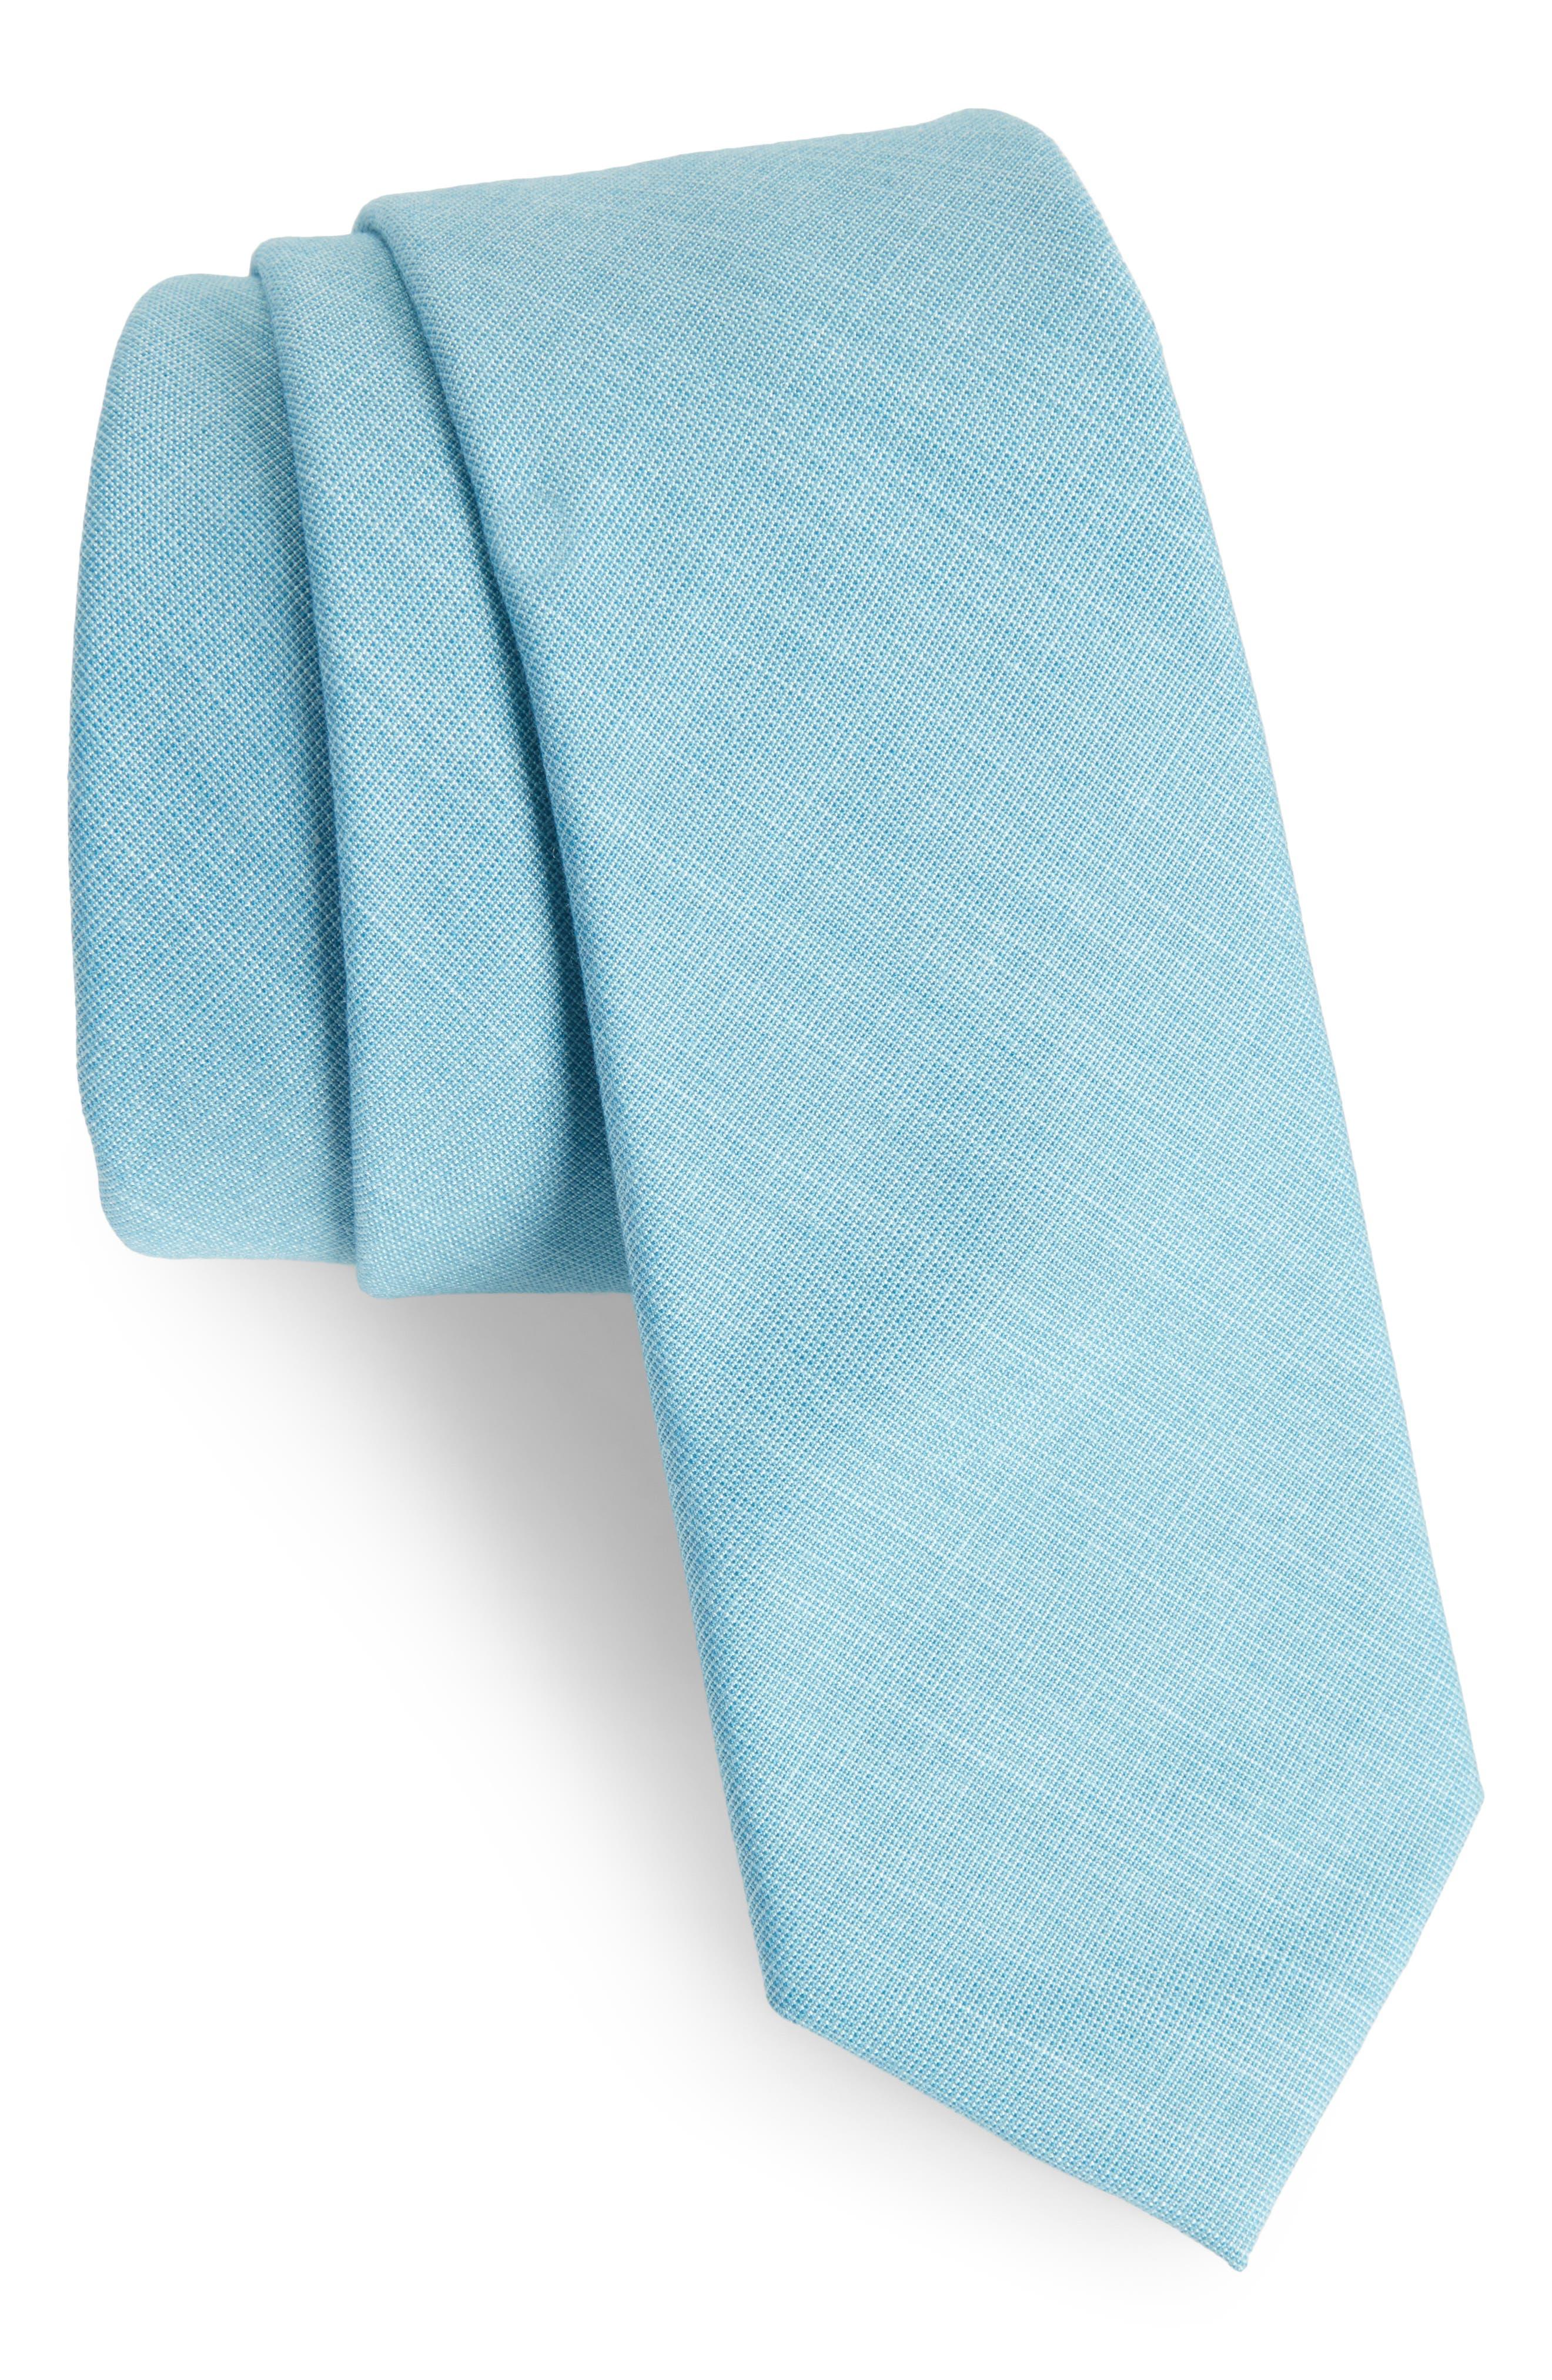 Alternate Image 1 Selected - Nordstrom Men's Shop Jeffry Solid Skinny Tie